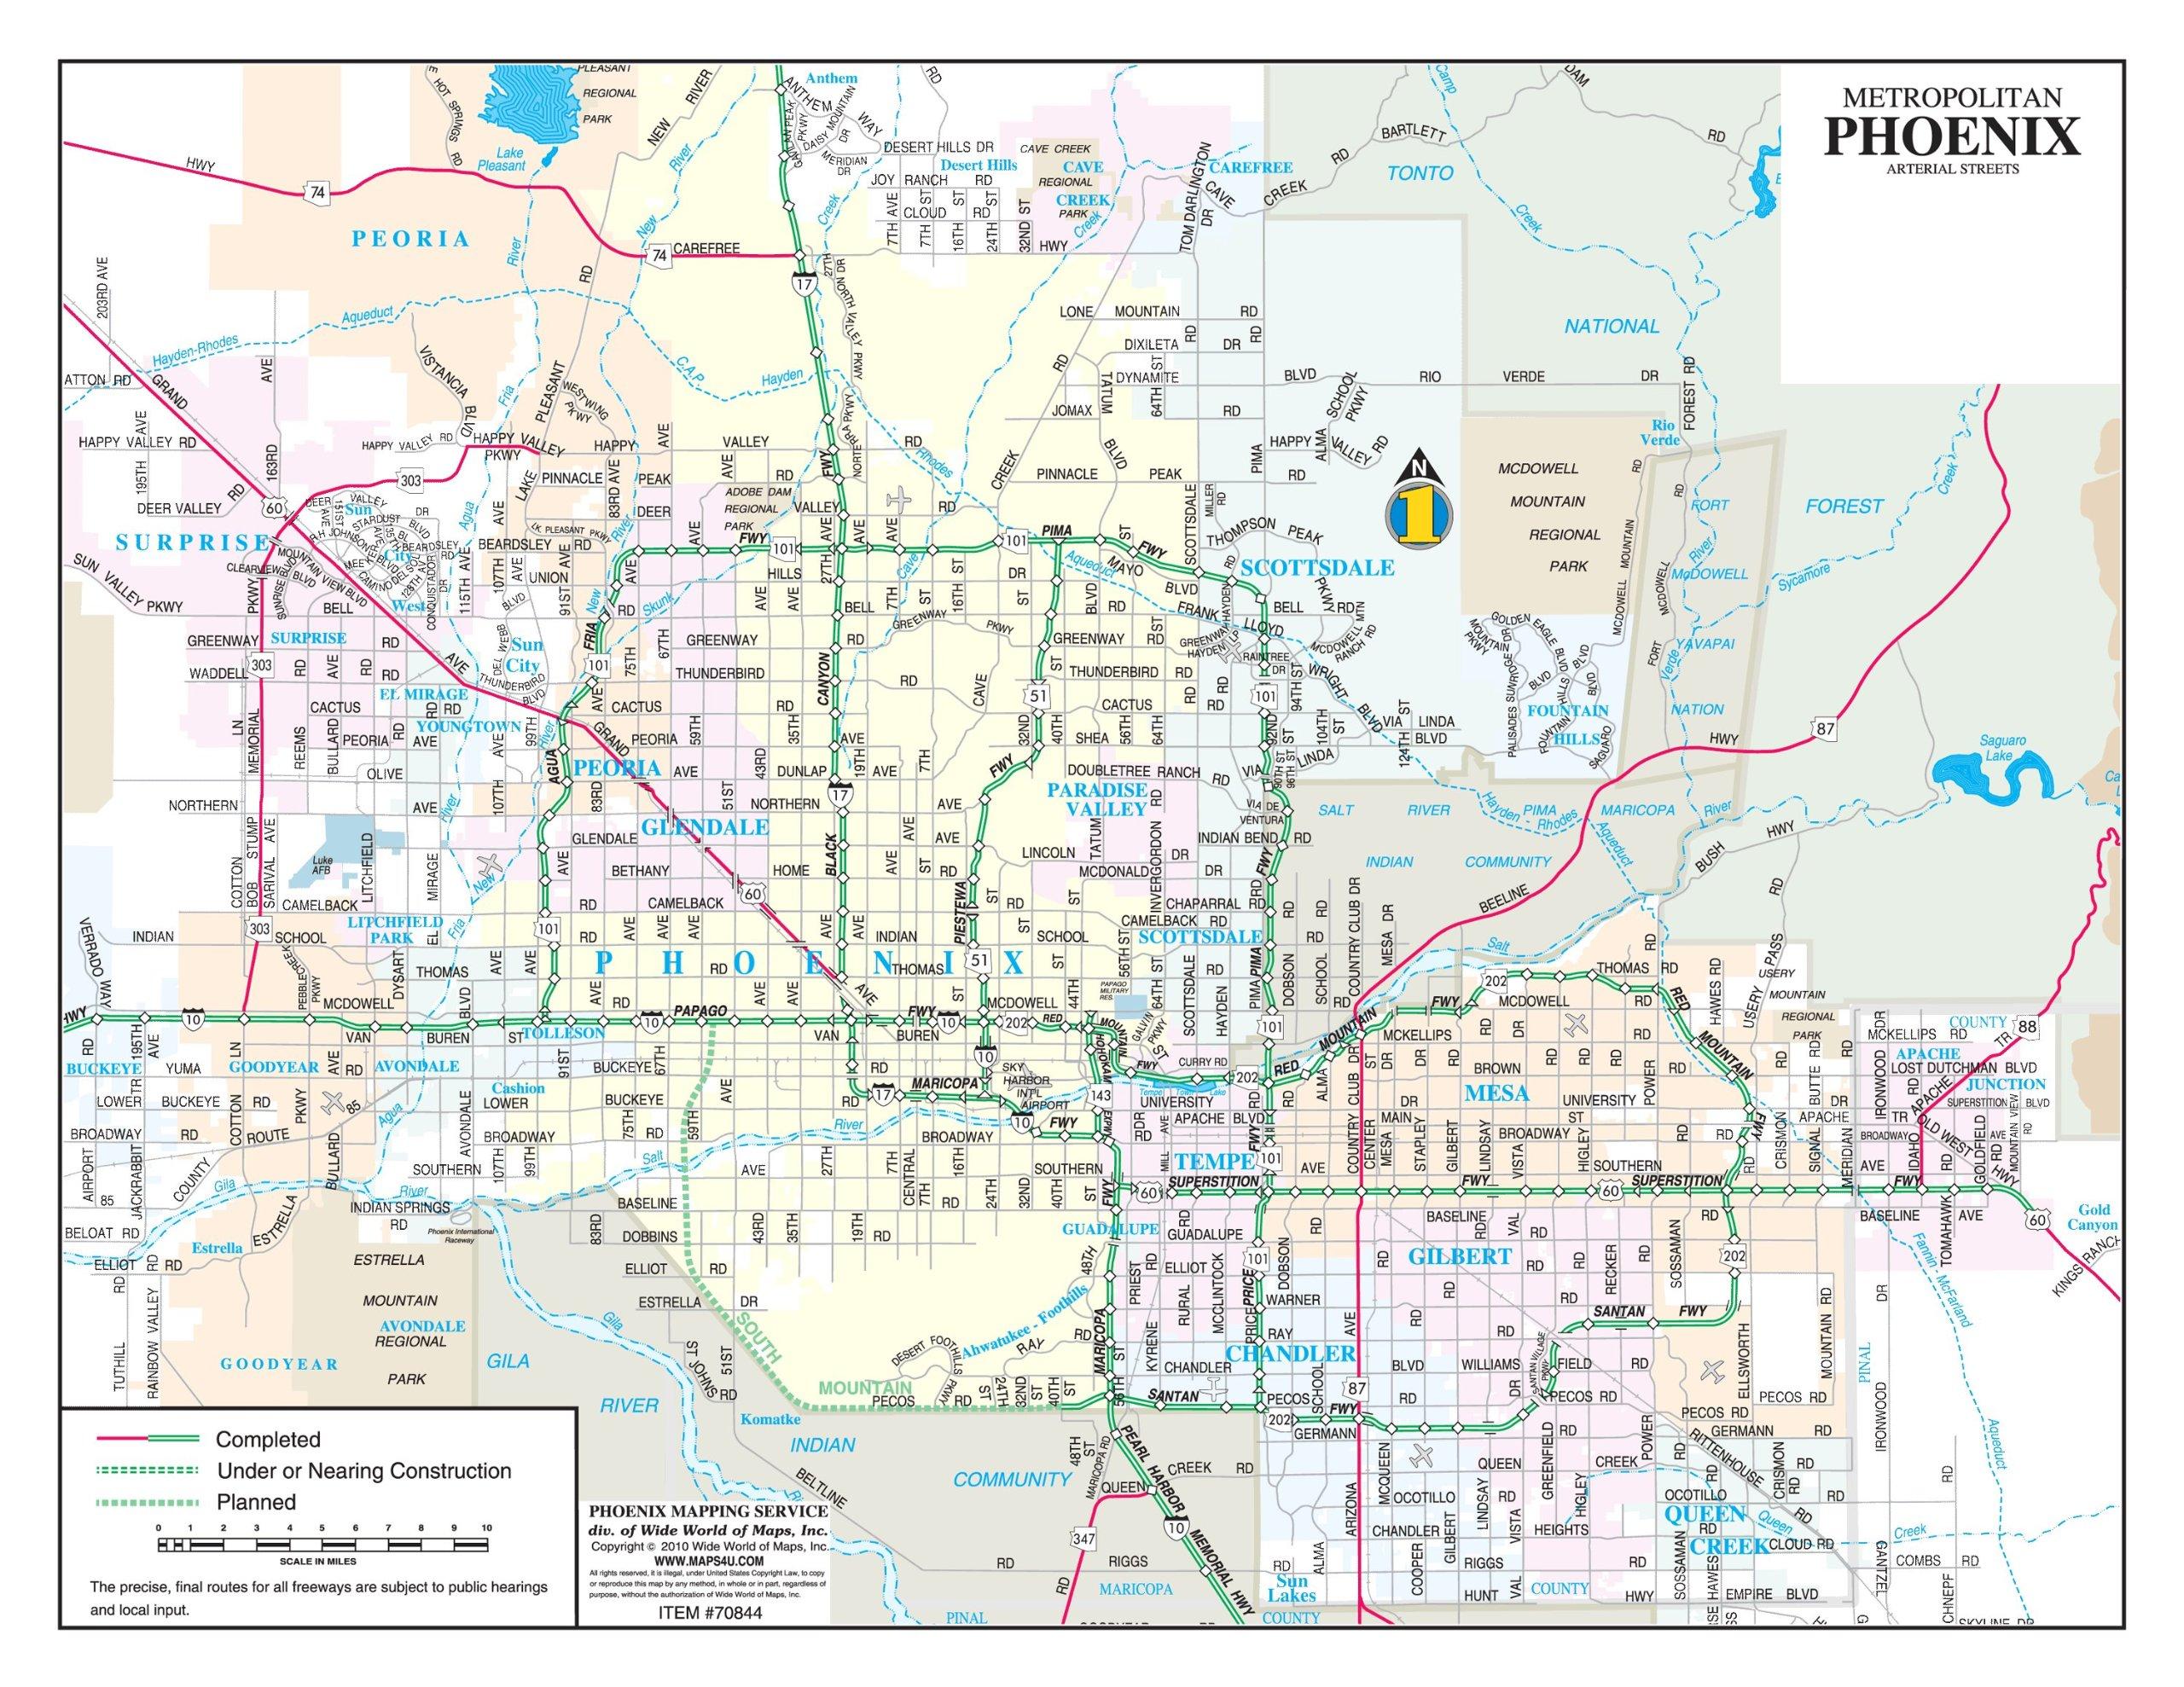 map of phoenix metro area Metropolitan Phoenix Arterial Streets Gloss Laminated Notebook Map map of phoenix metro area